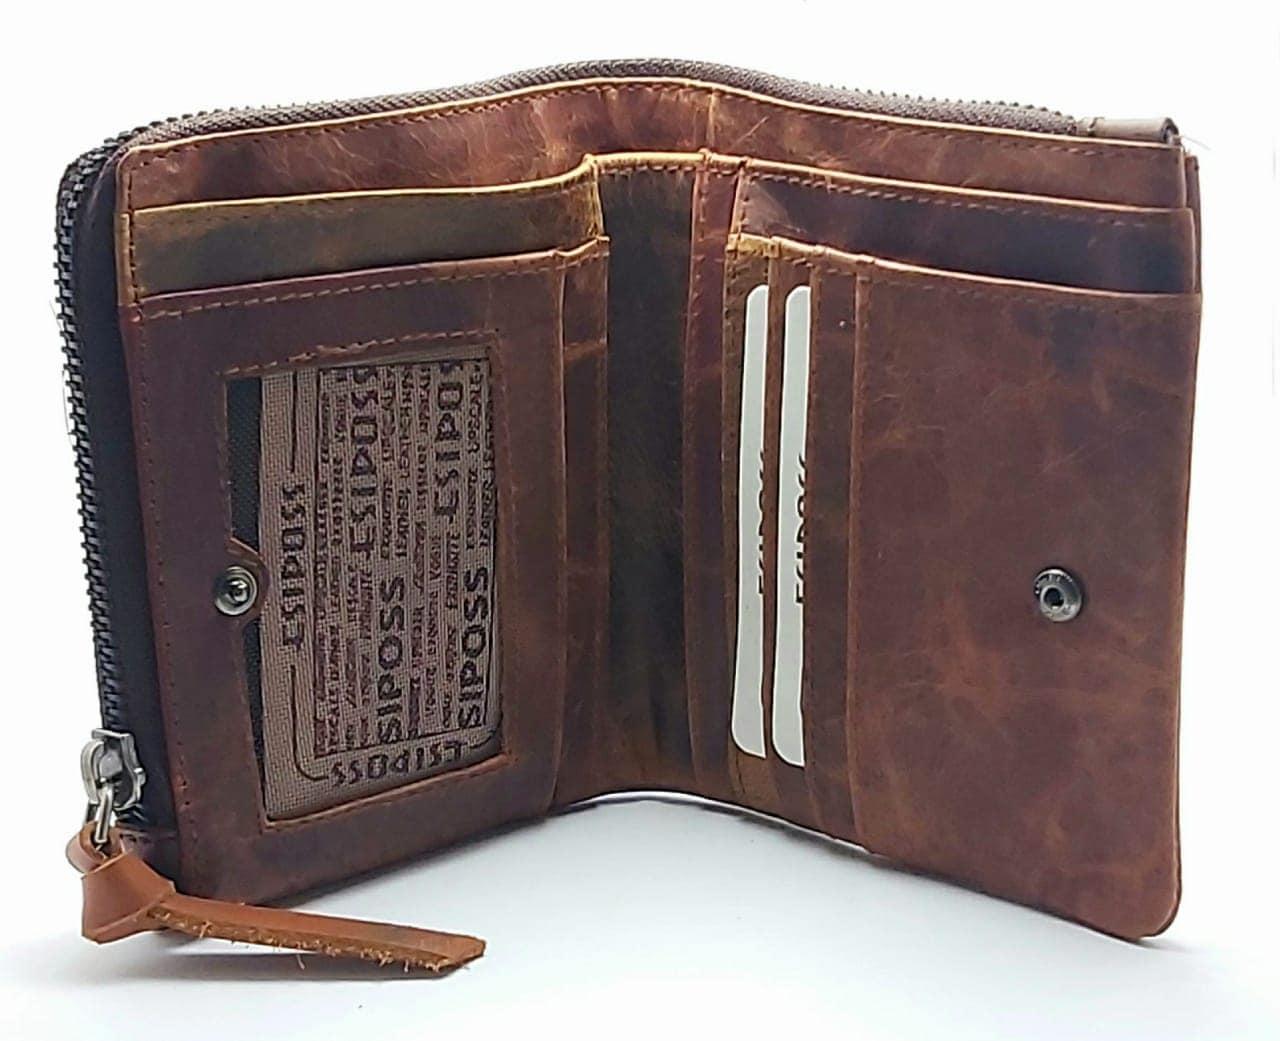 ESIPOSS Wallet EP04 Men Genuine Leather Men Purse Vintage With Zipper Coin Pocket Famous Brand Designer Wallets For Men Money Bag